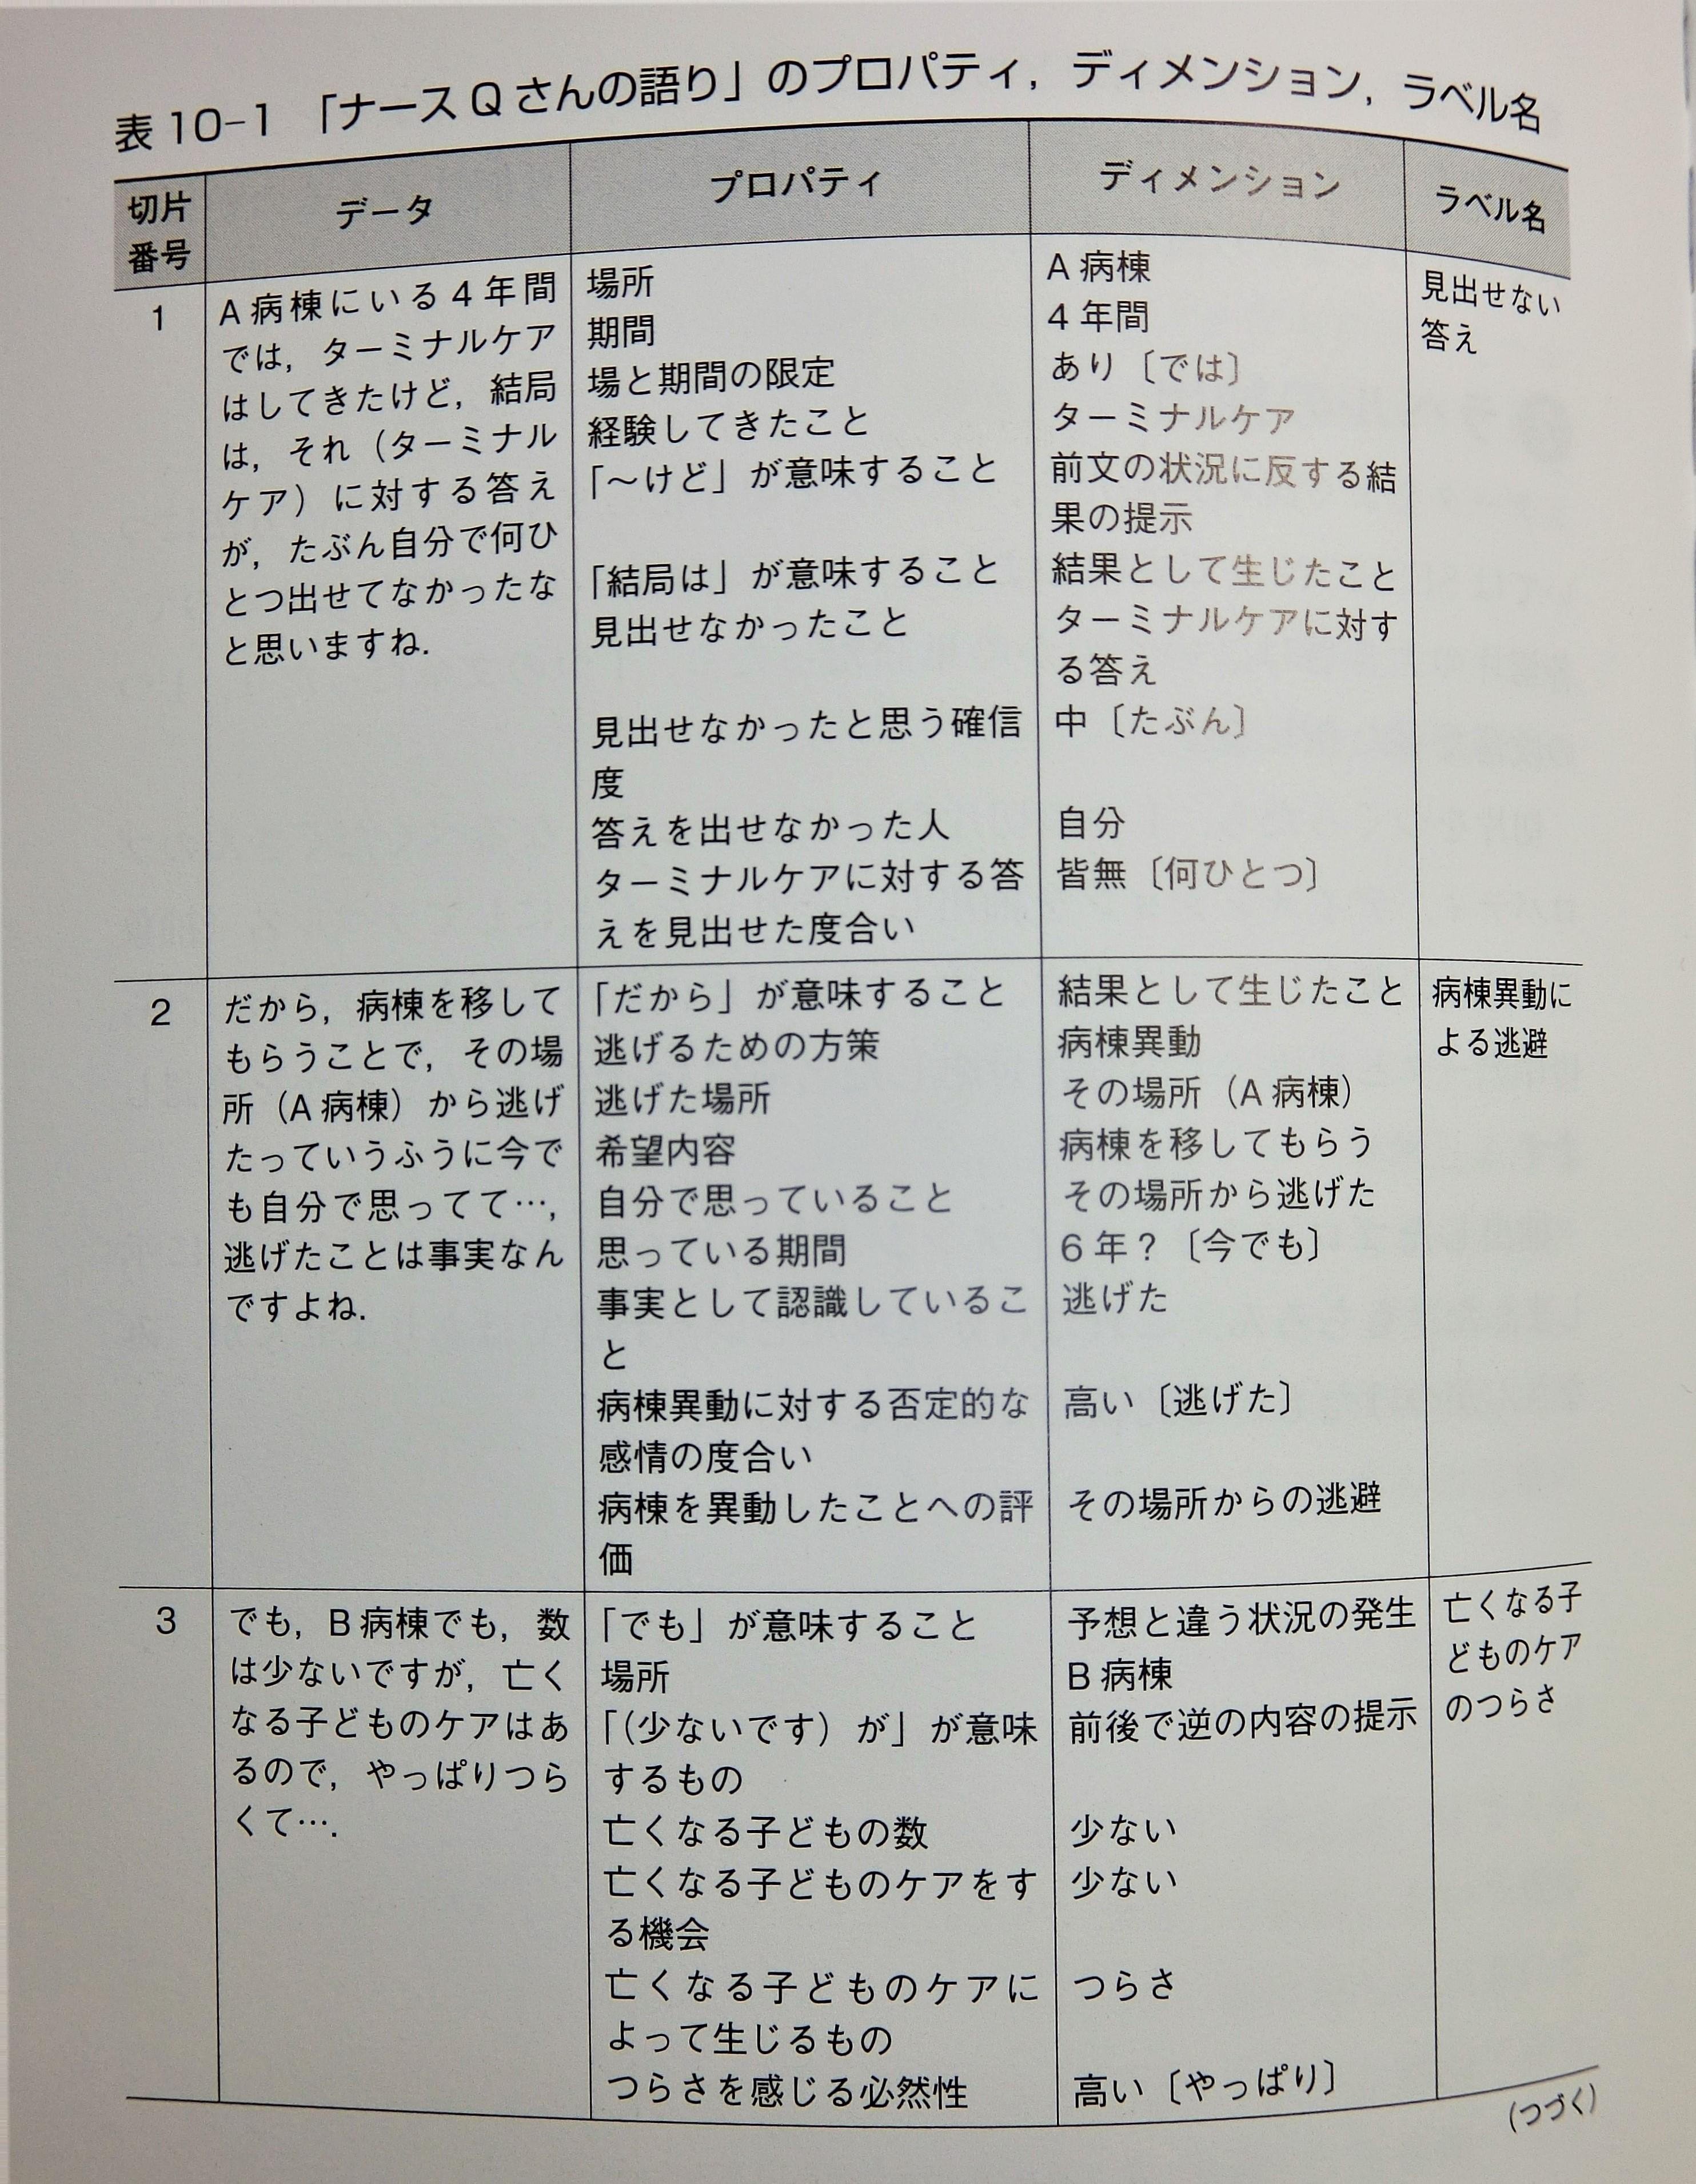 http://igs-kankan.com/article/a5983c38e48d9a63f7d9f1b906185b5e41819c0a.jpg